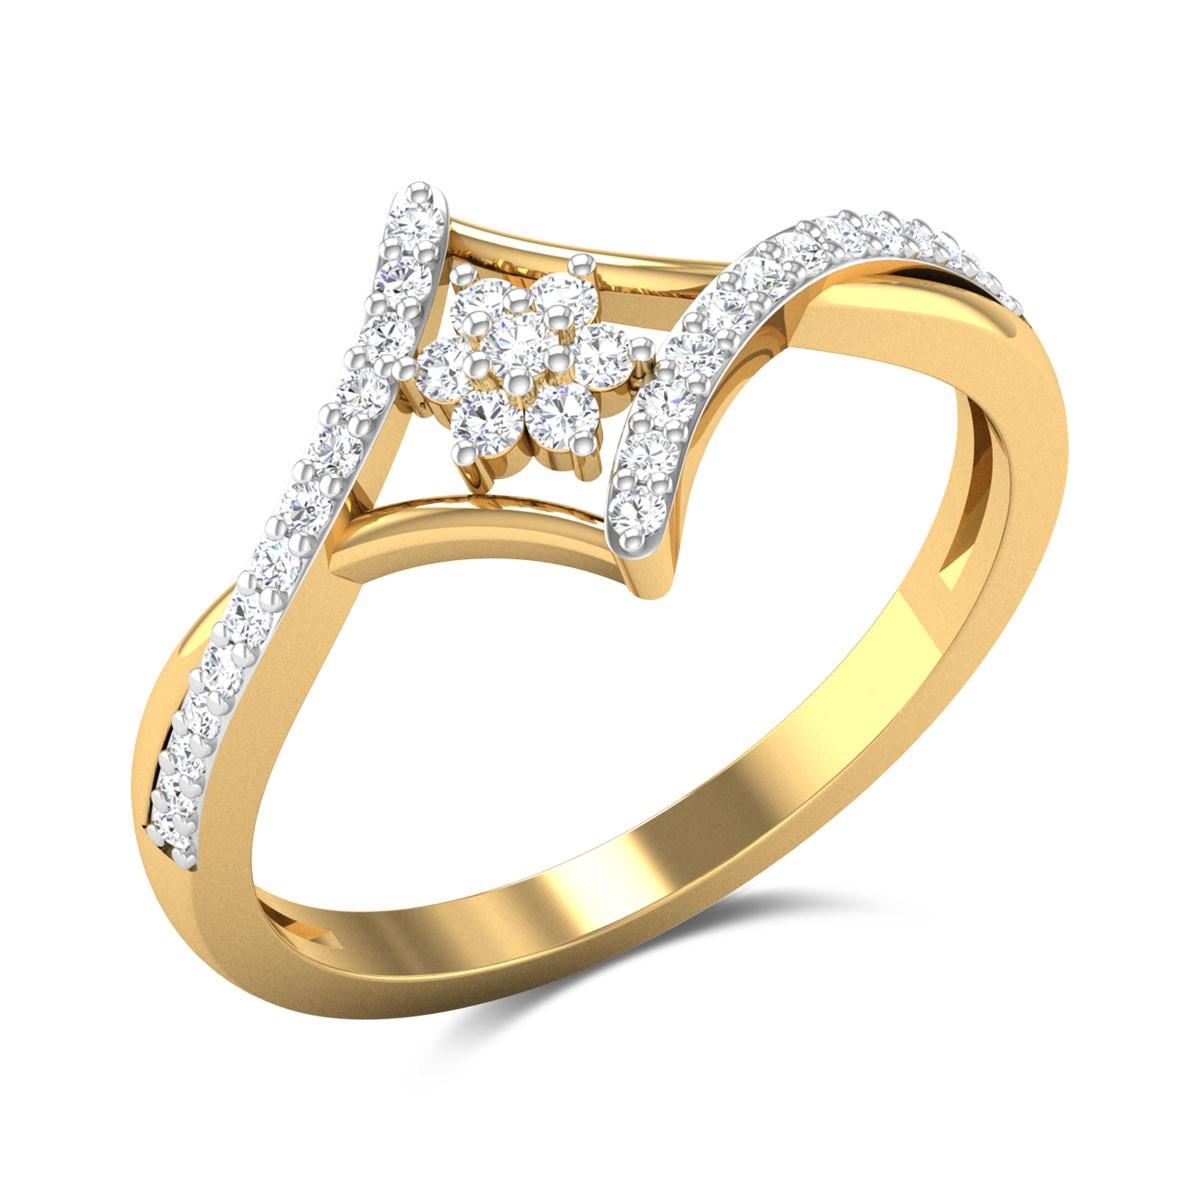 Edelweiss Diamond Ring